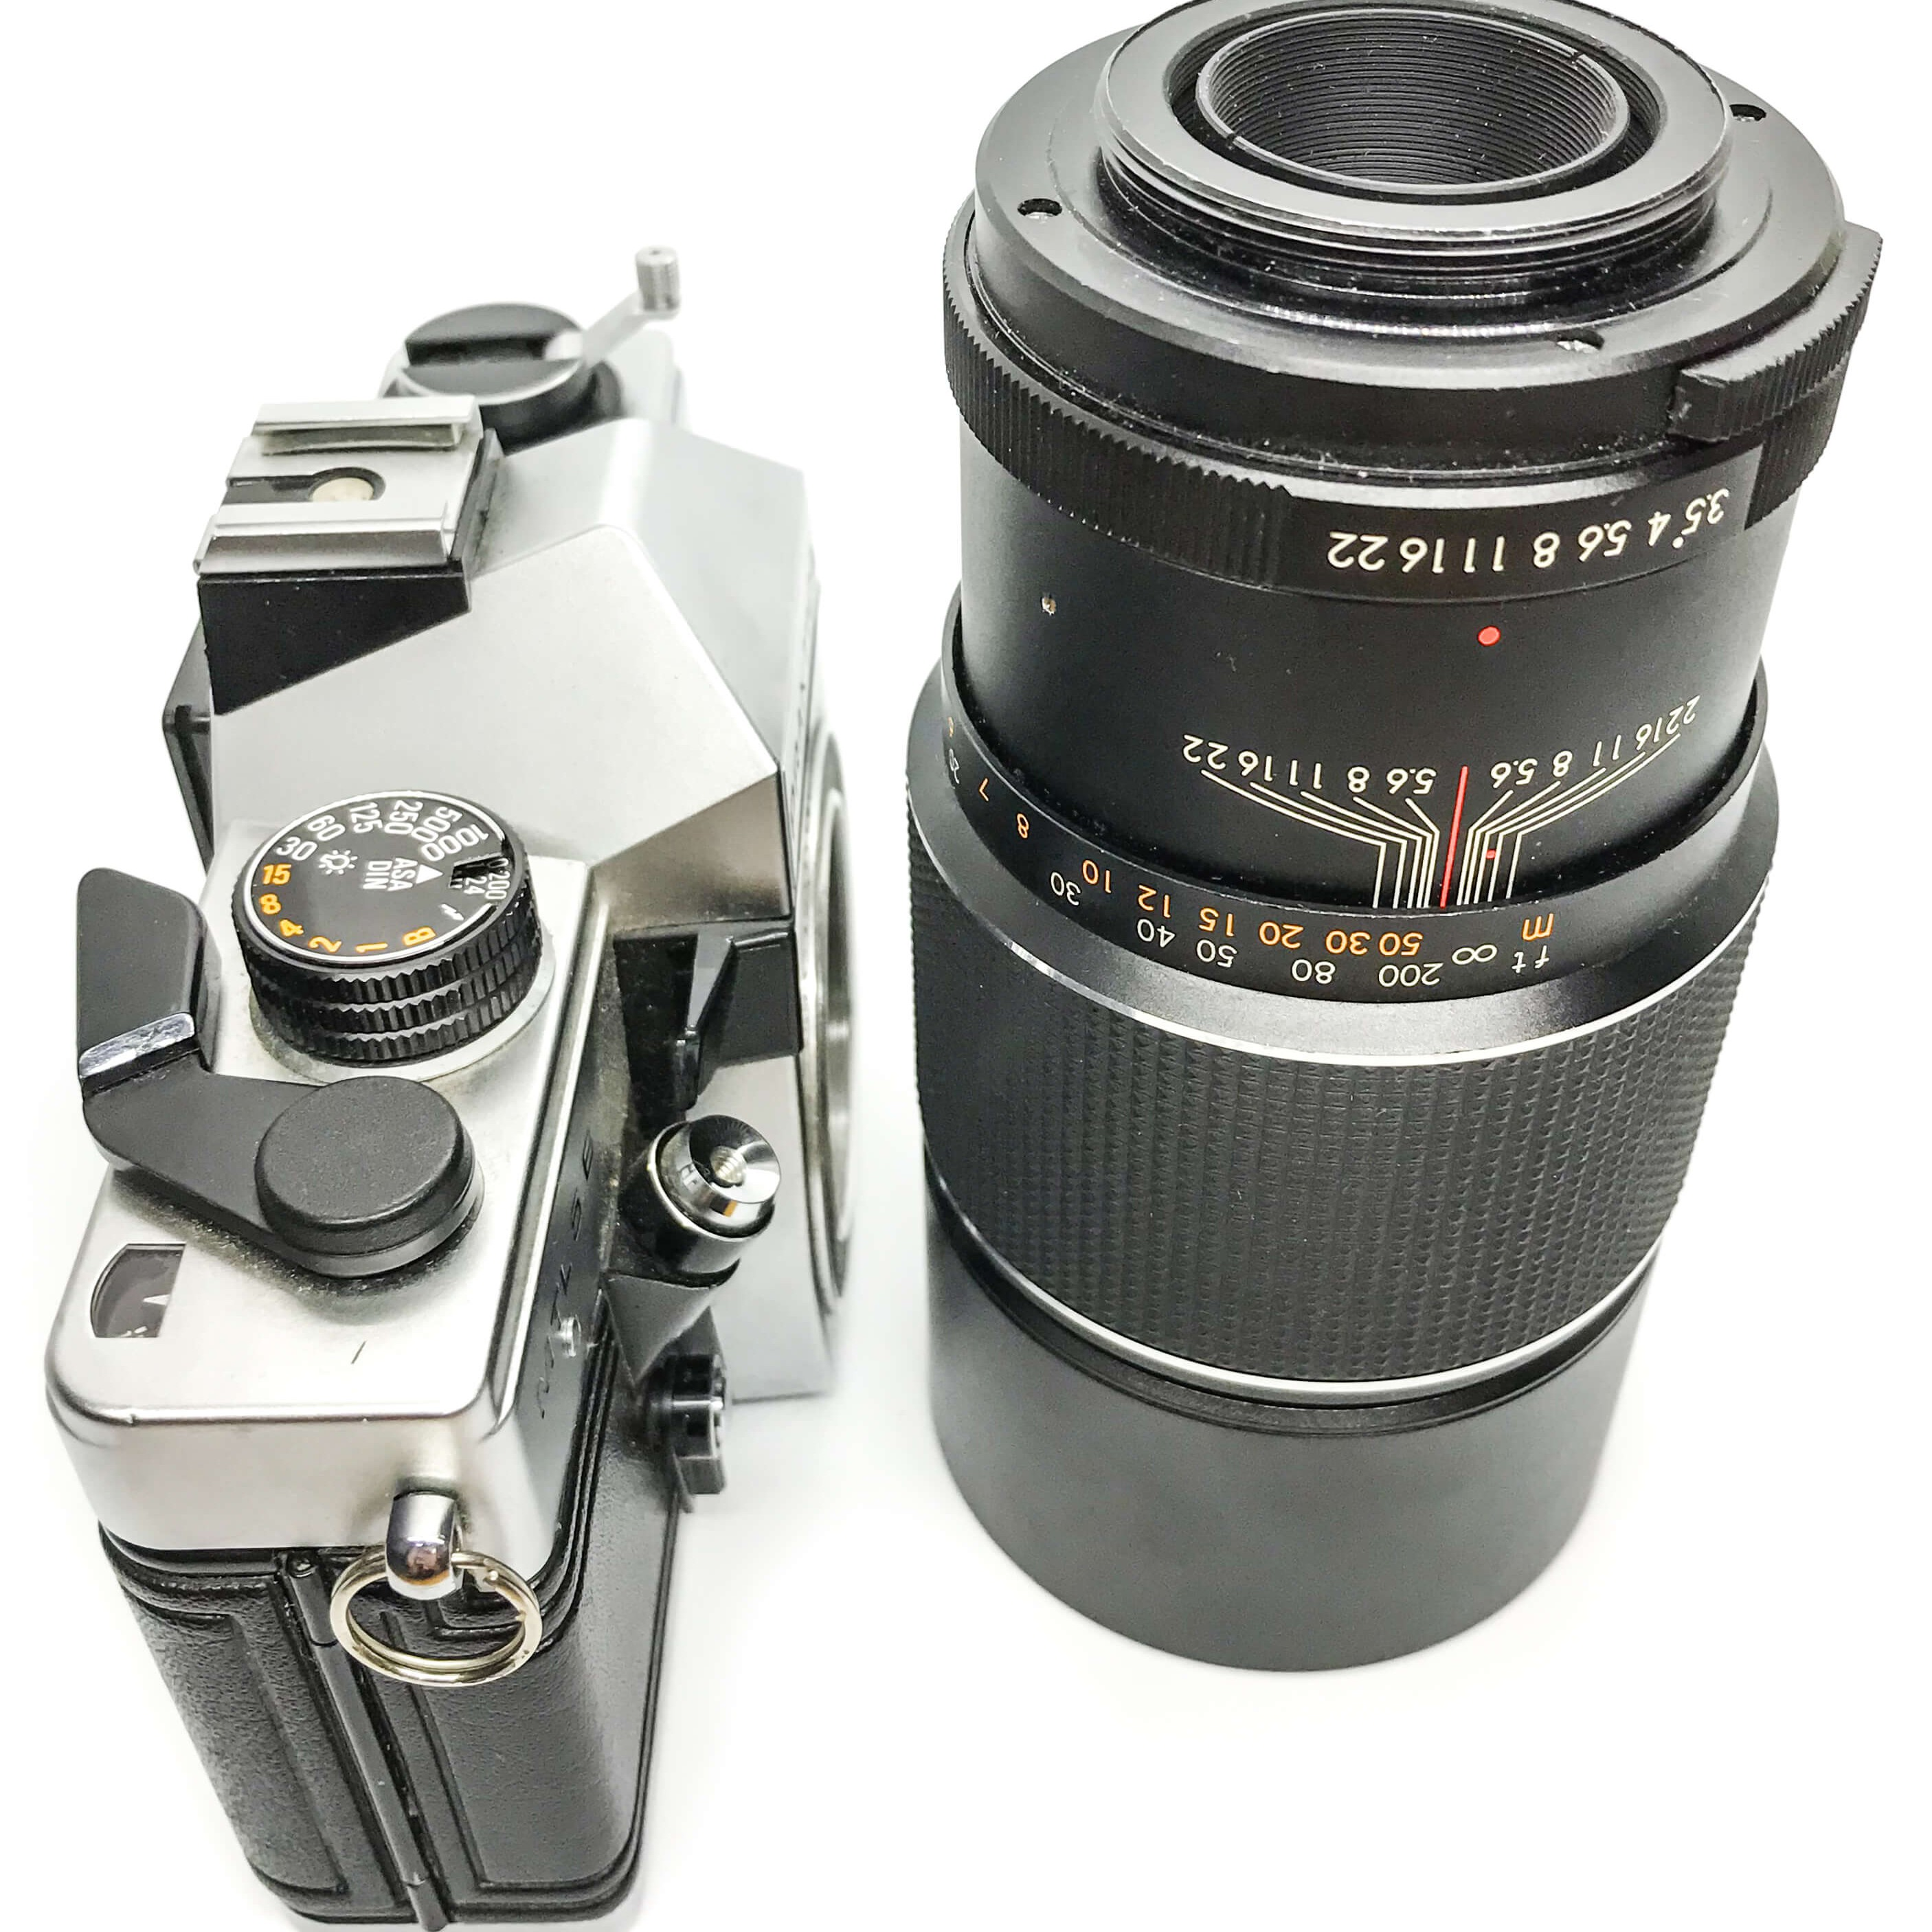 Praktica MTL5 B 35mm Film Camera and 200mm Lens on white background 35mm film camera vintage